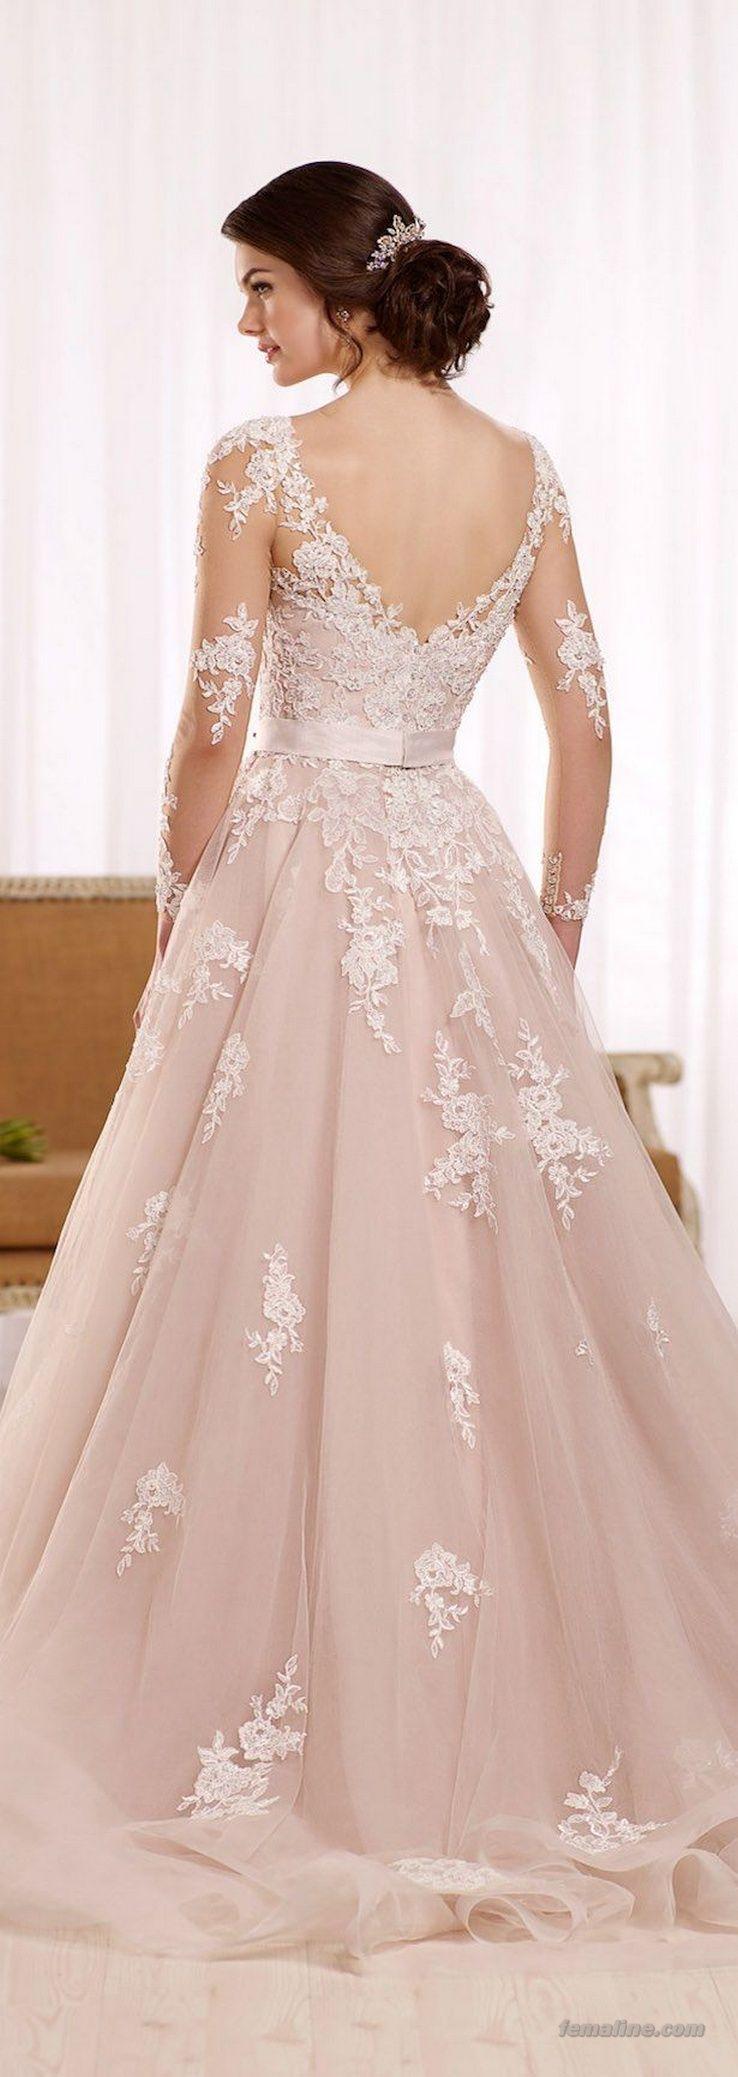 139 Ideas for Fall 2017 Wedding Dress Trends | Hochzeitskleider ...